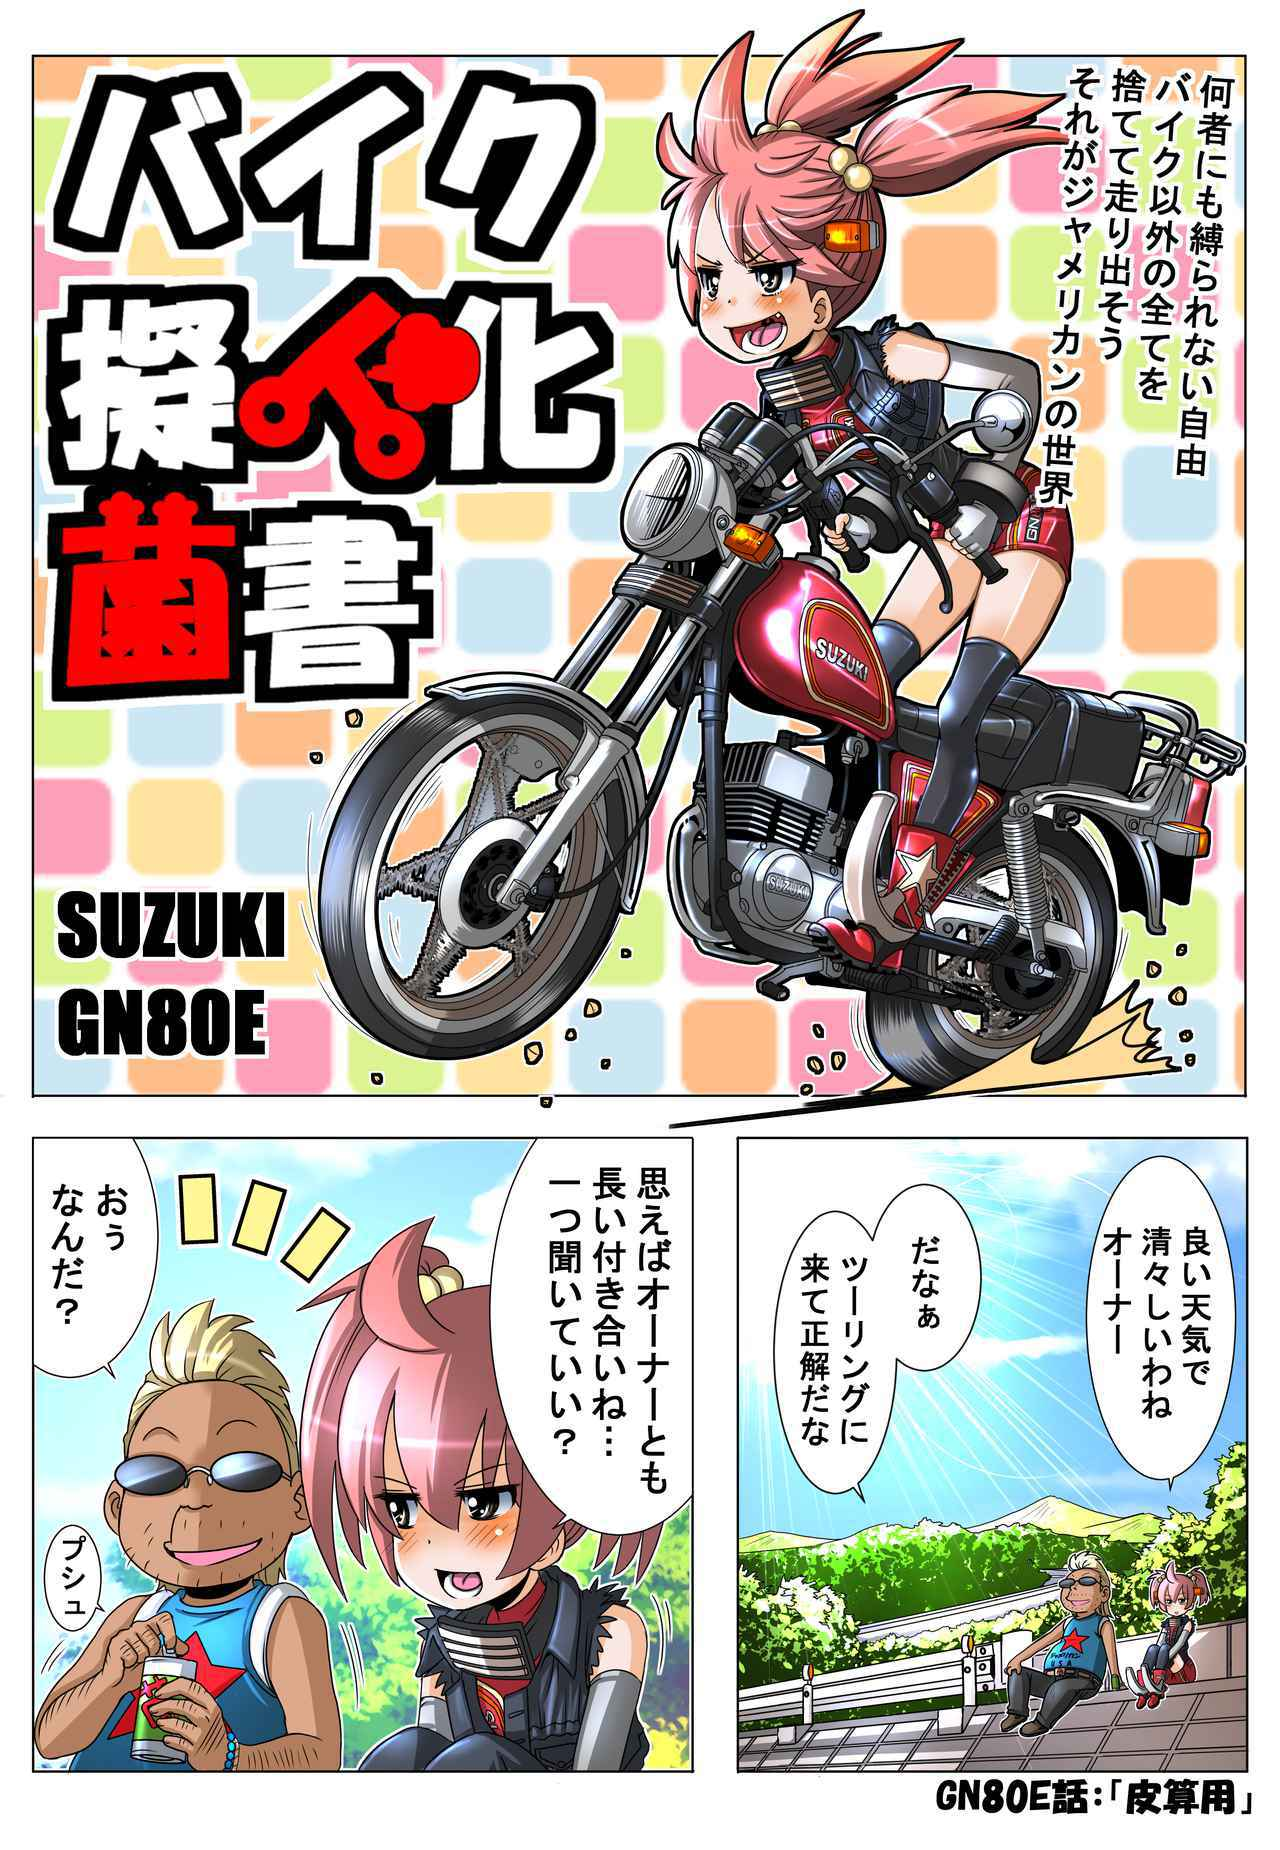 画像1: 『バイク擬人化菌書』GN80E 話「皮算用」 作:鈴木秀吉